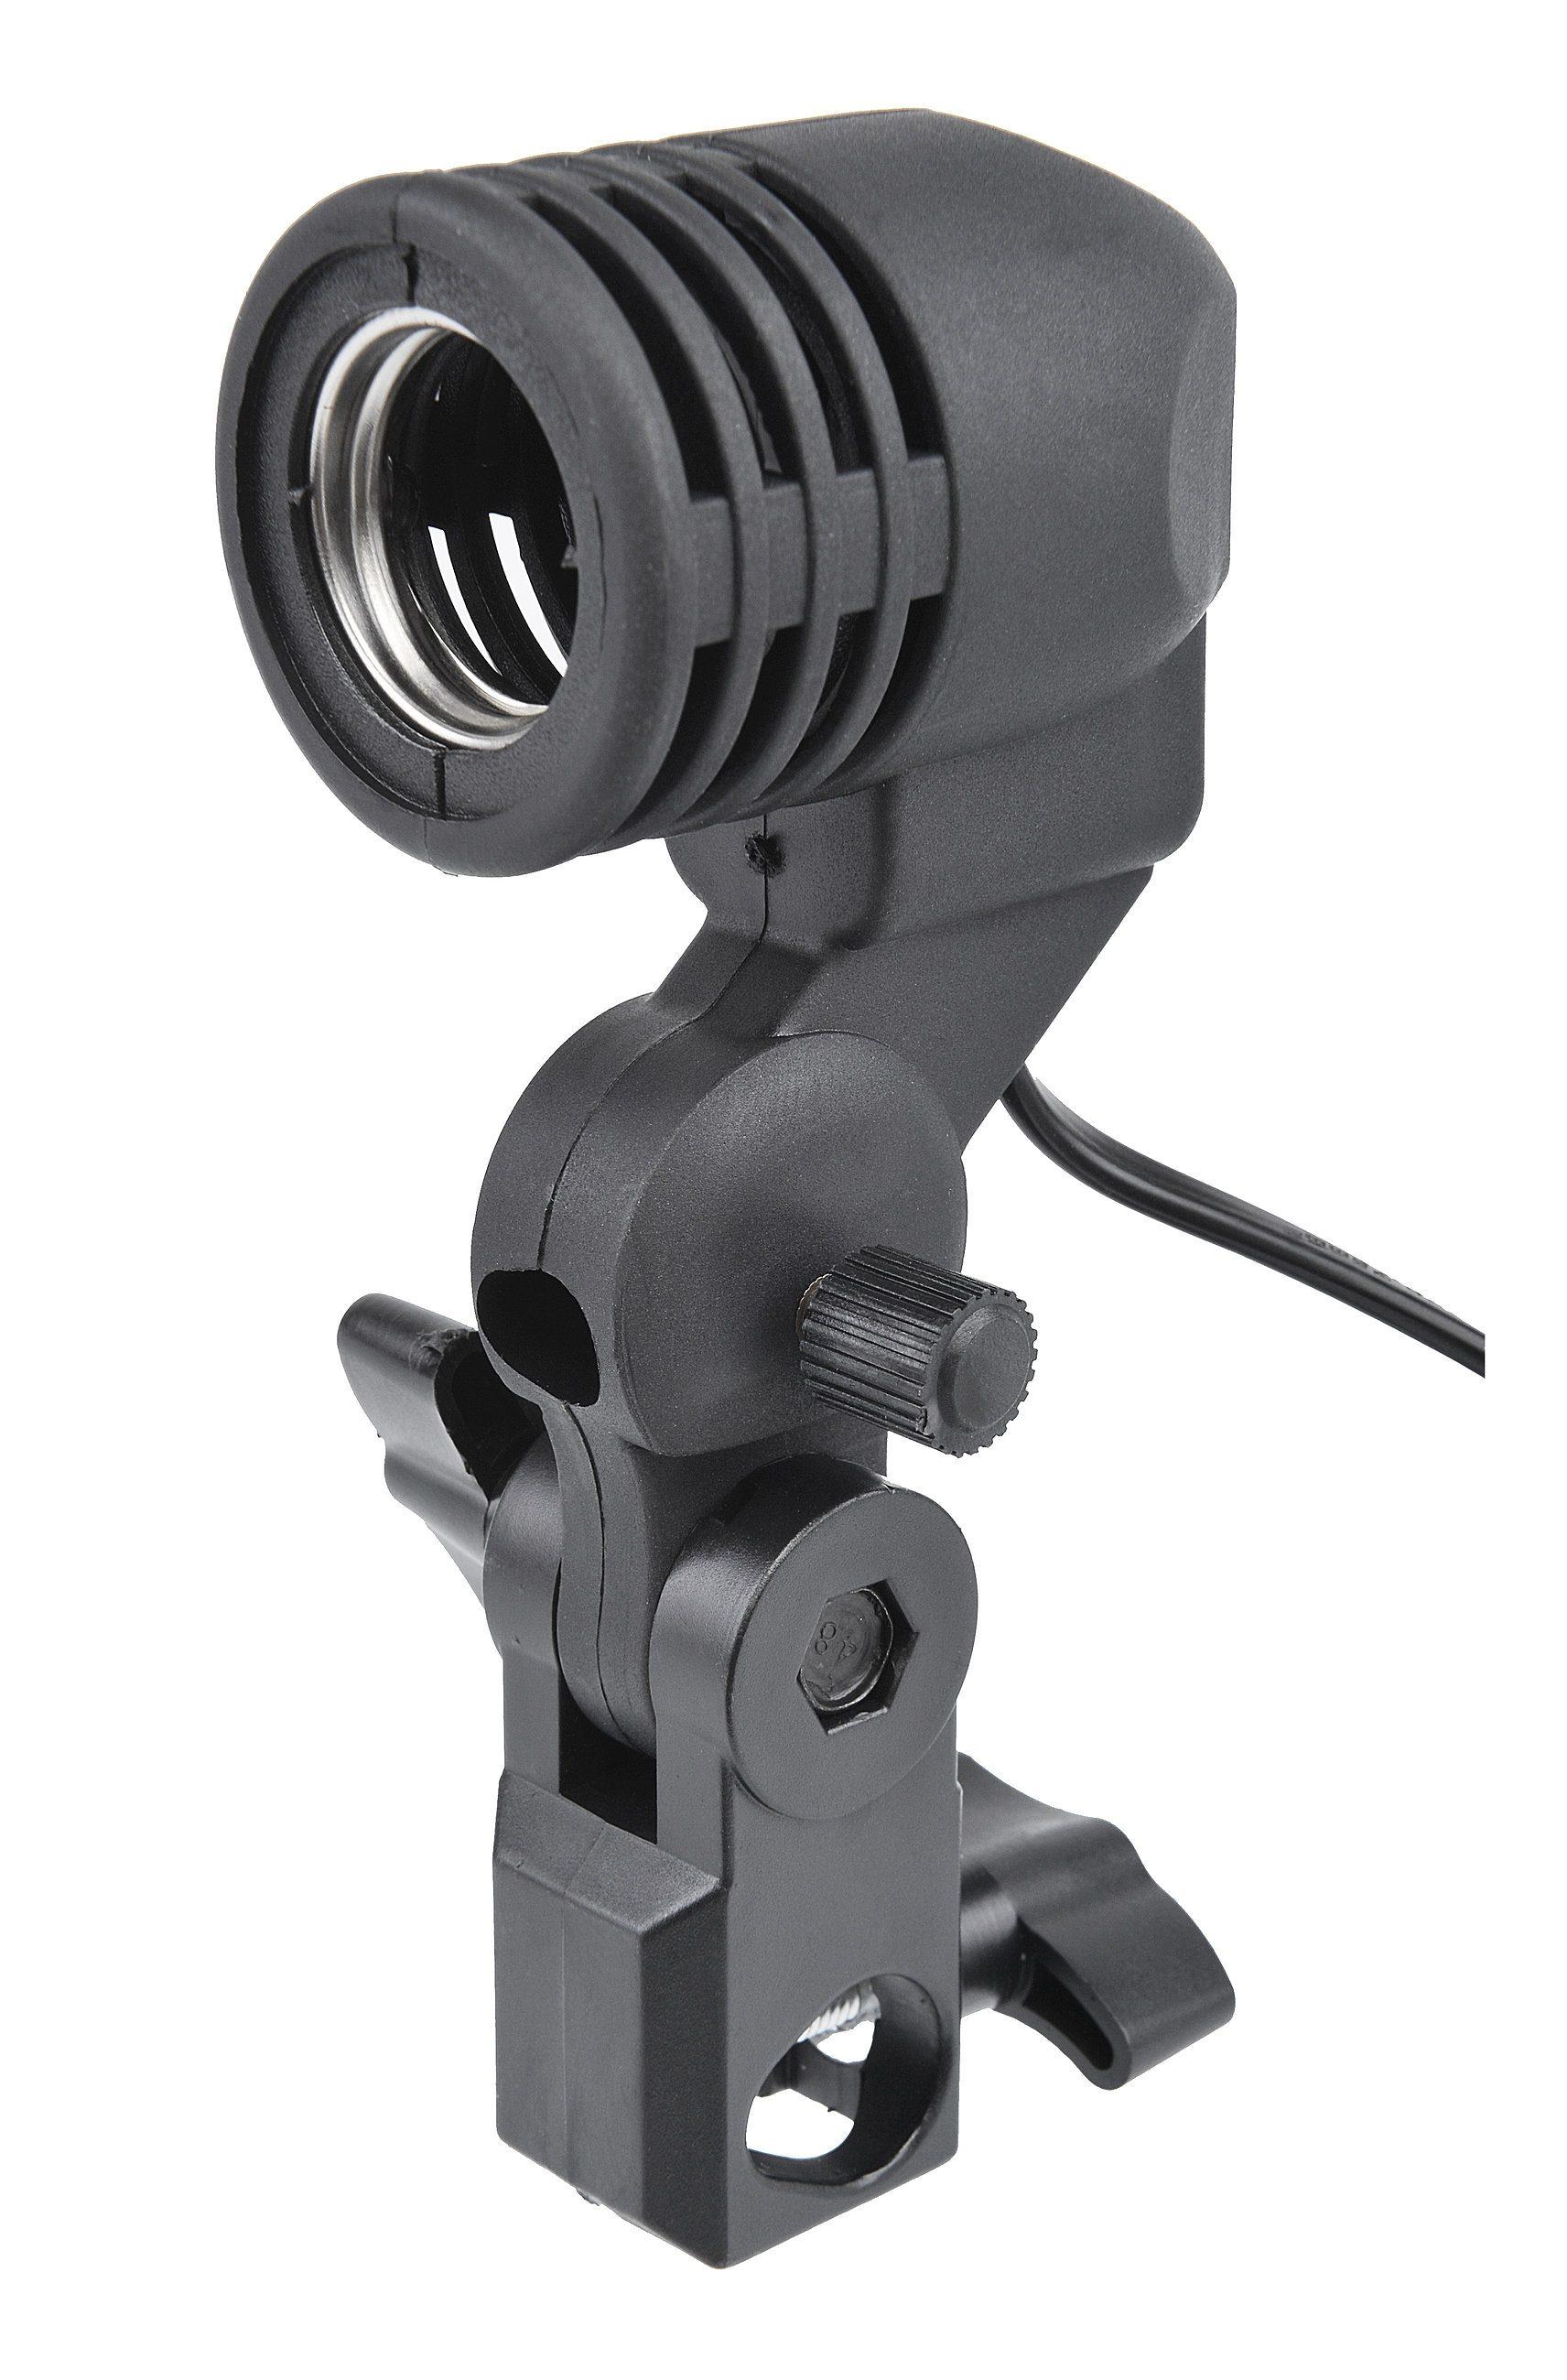 BRESSER Fotostudio »BRESSER MM-01 Universeller Lampenhalter für 1 Lamp«